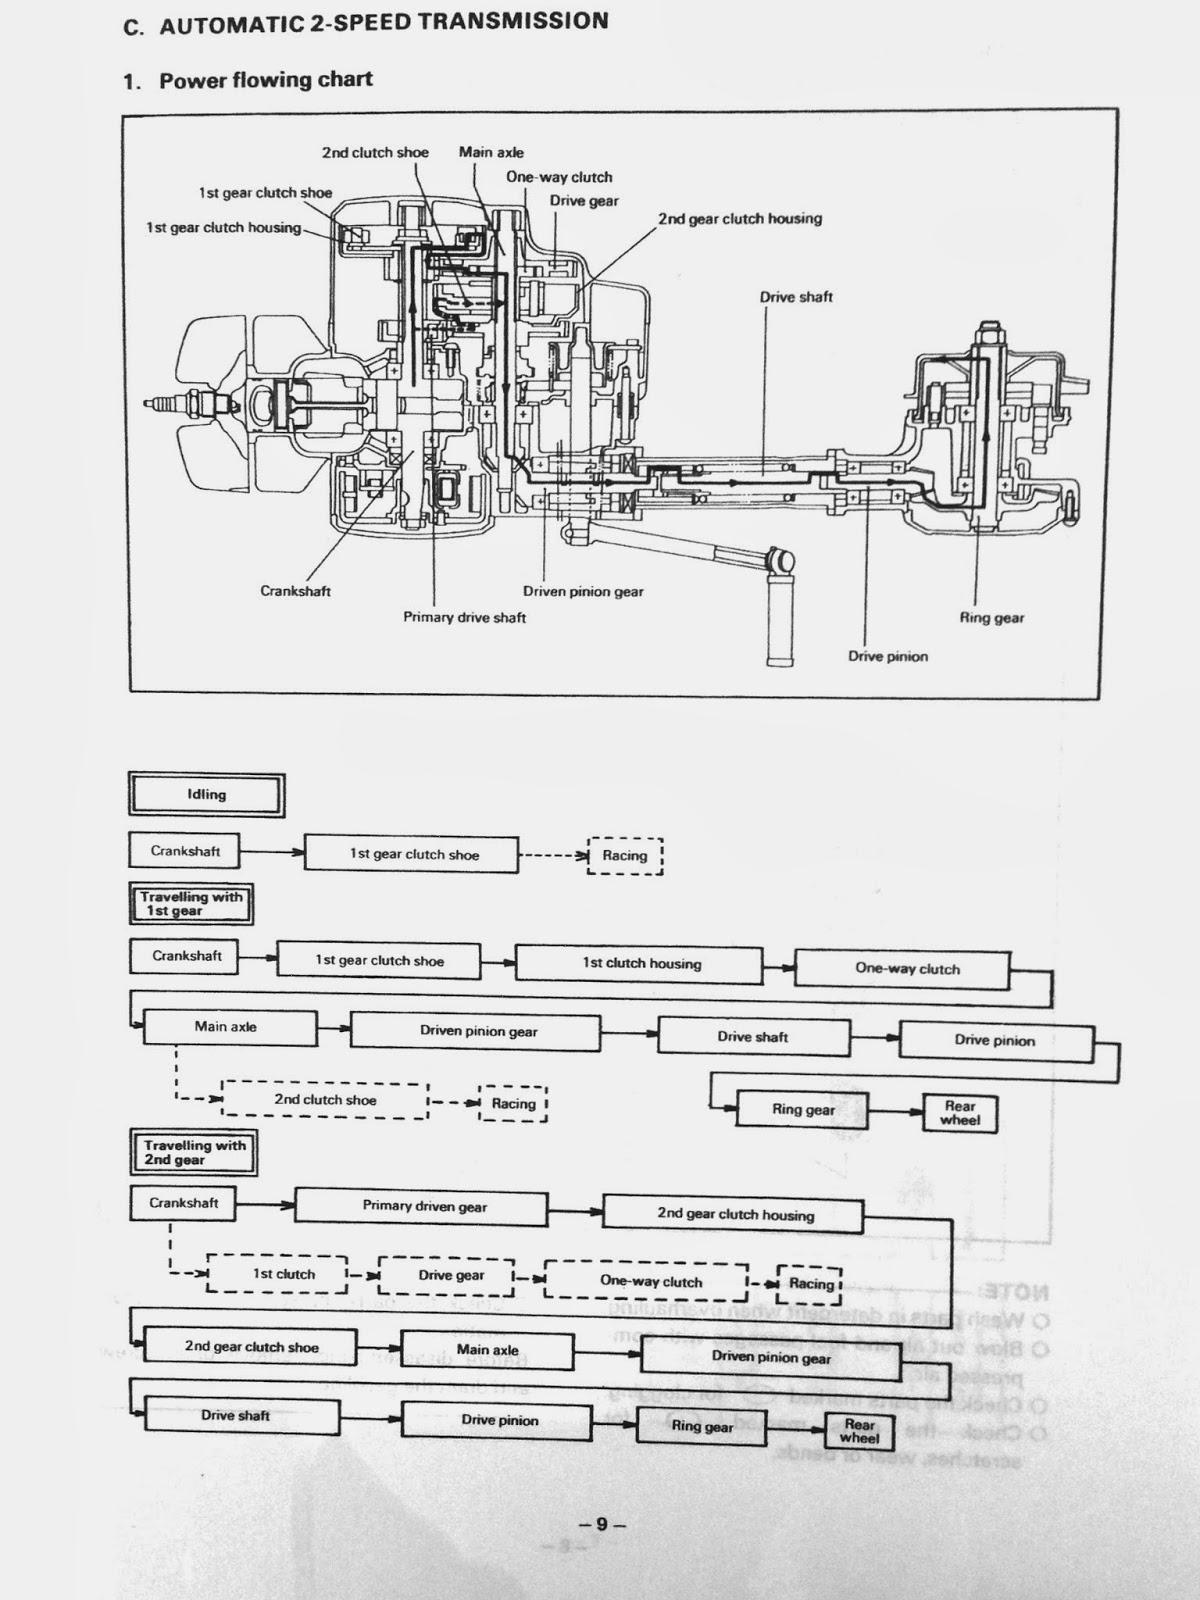 yamaha lc50 yamaha lc50 service manual yamaha solenoid diagram lc 50 service manual in jpg format